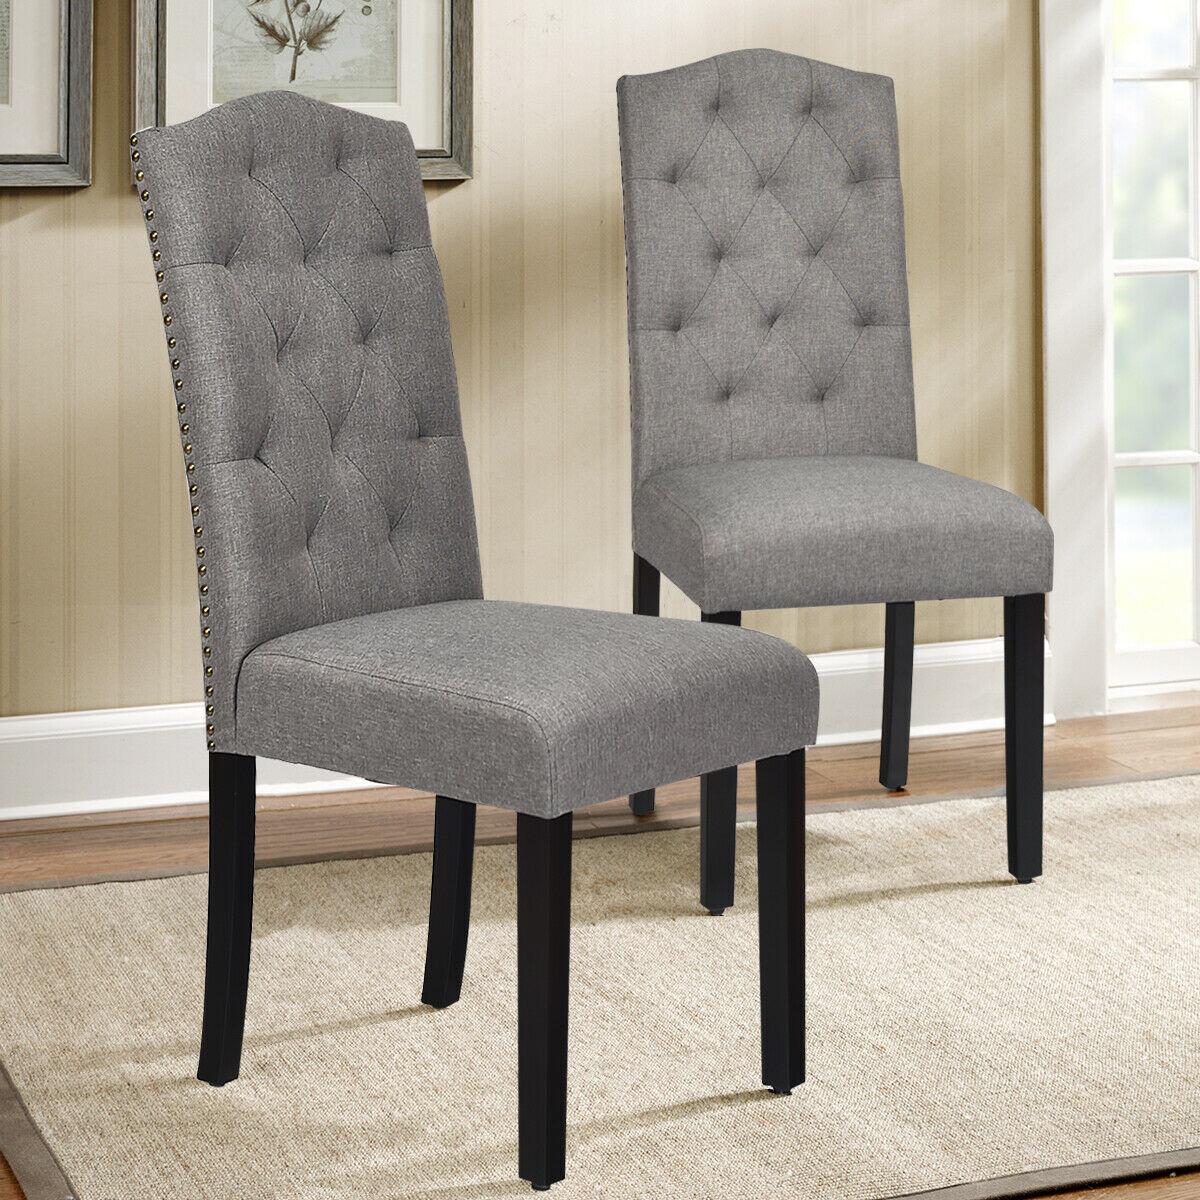 Red Barrel Studio Eastport Tufted Linen Upholstered Parsons Chair Wayfair